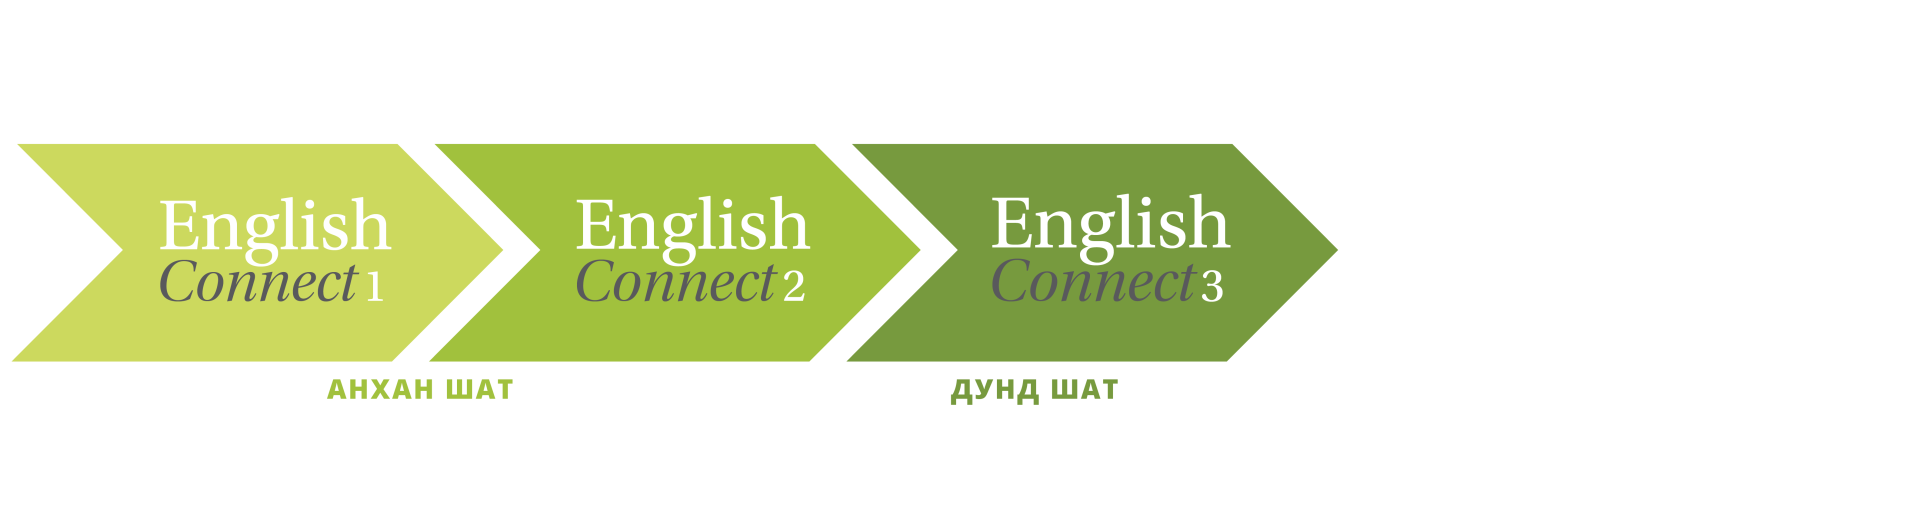 EnglishConnect шеврон шигтгээ зураг